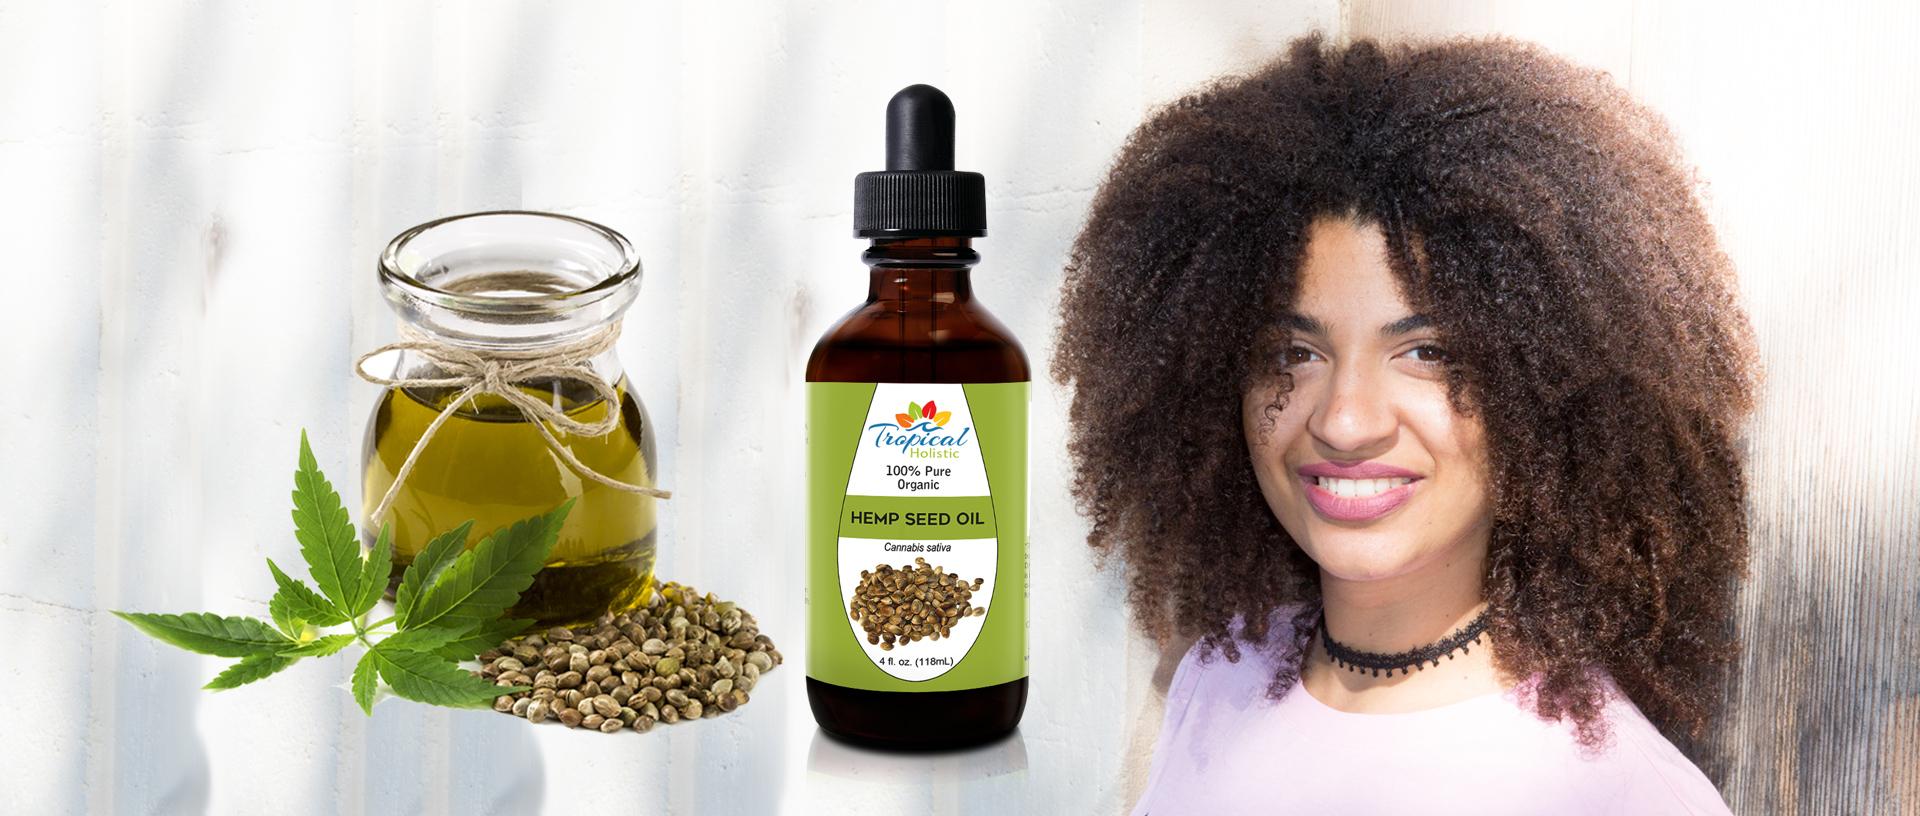 Tropical Holistic 100% Pure Organic Hemp Seed Oil